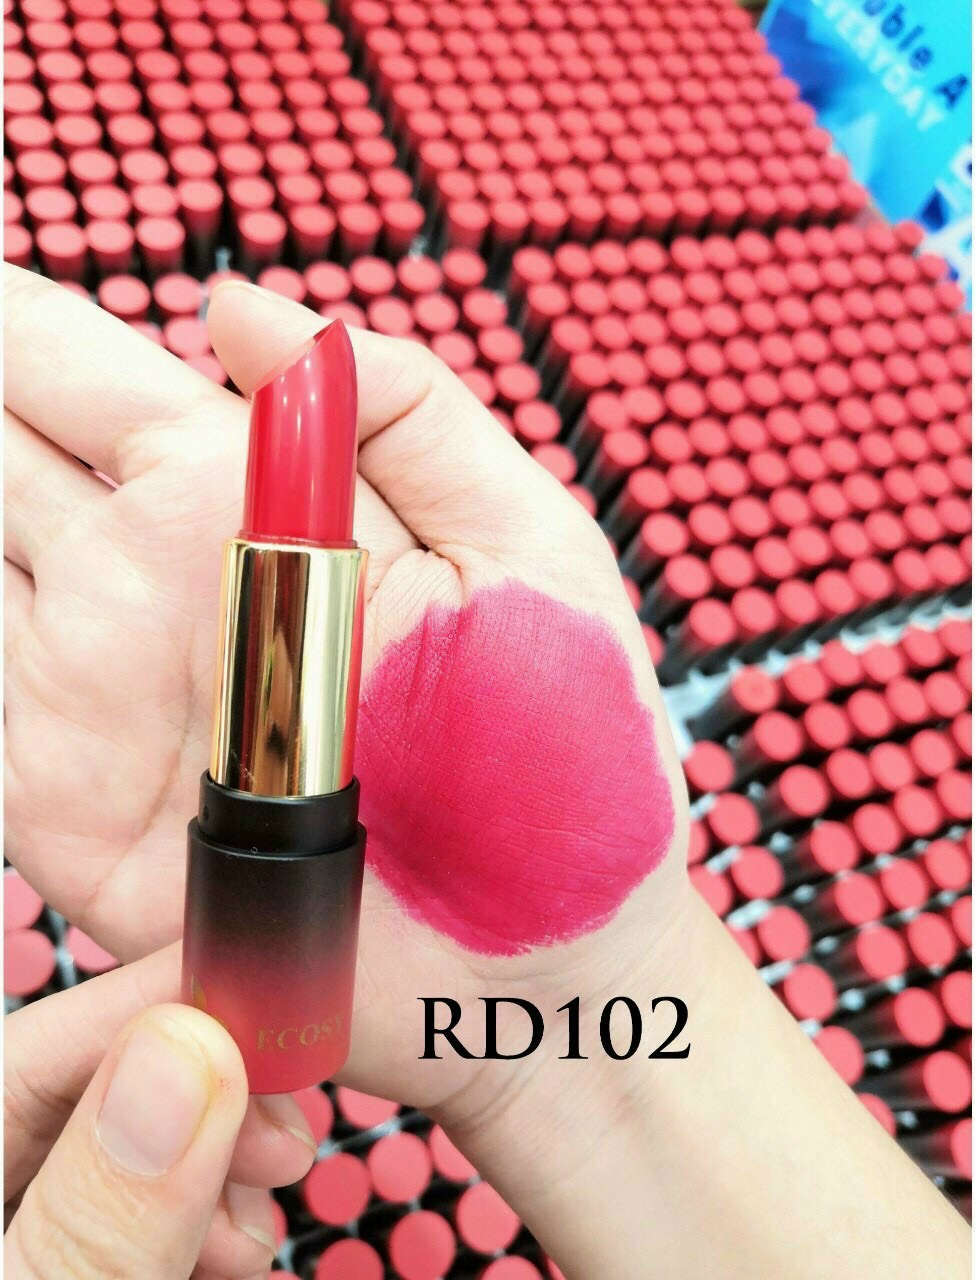 trang-diem-doi-moi-son-li-ecosy-nature-lipstick-the-collagen-426